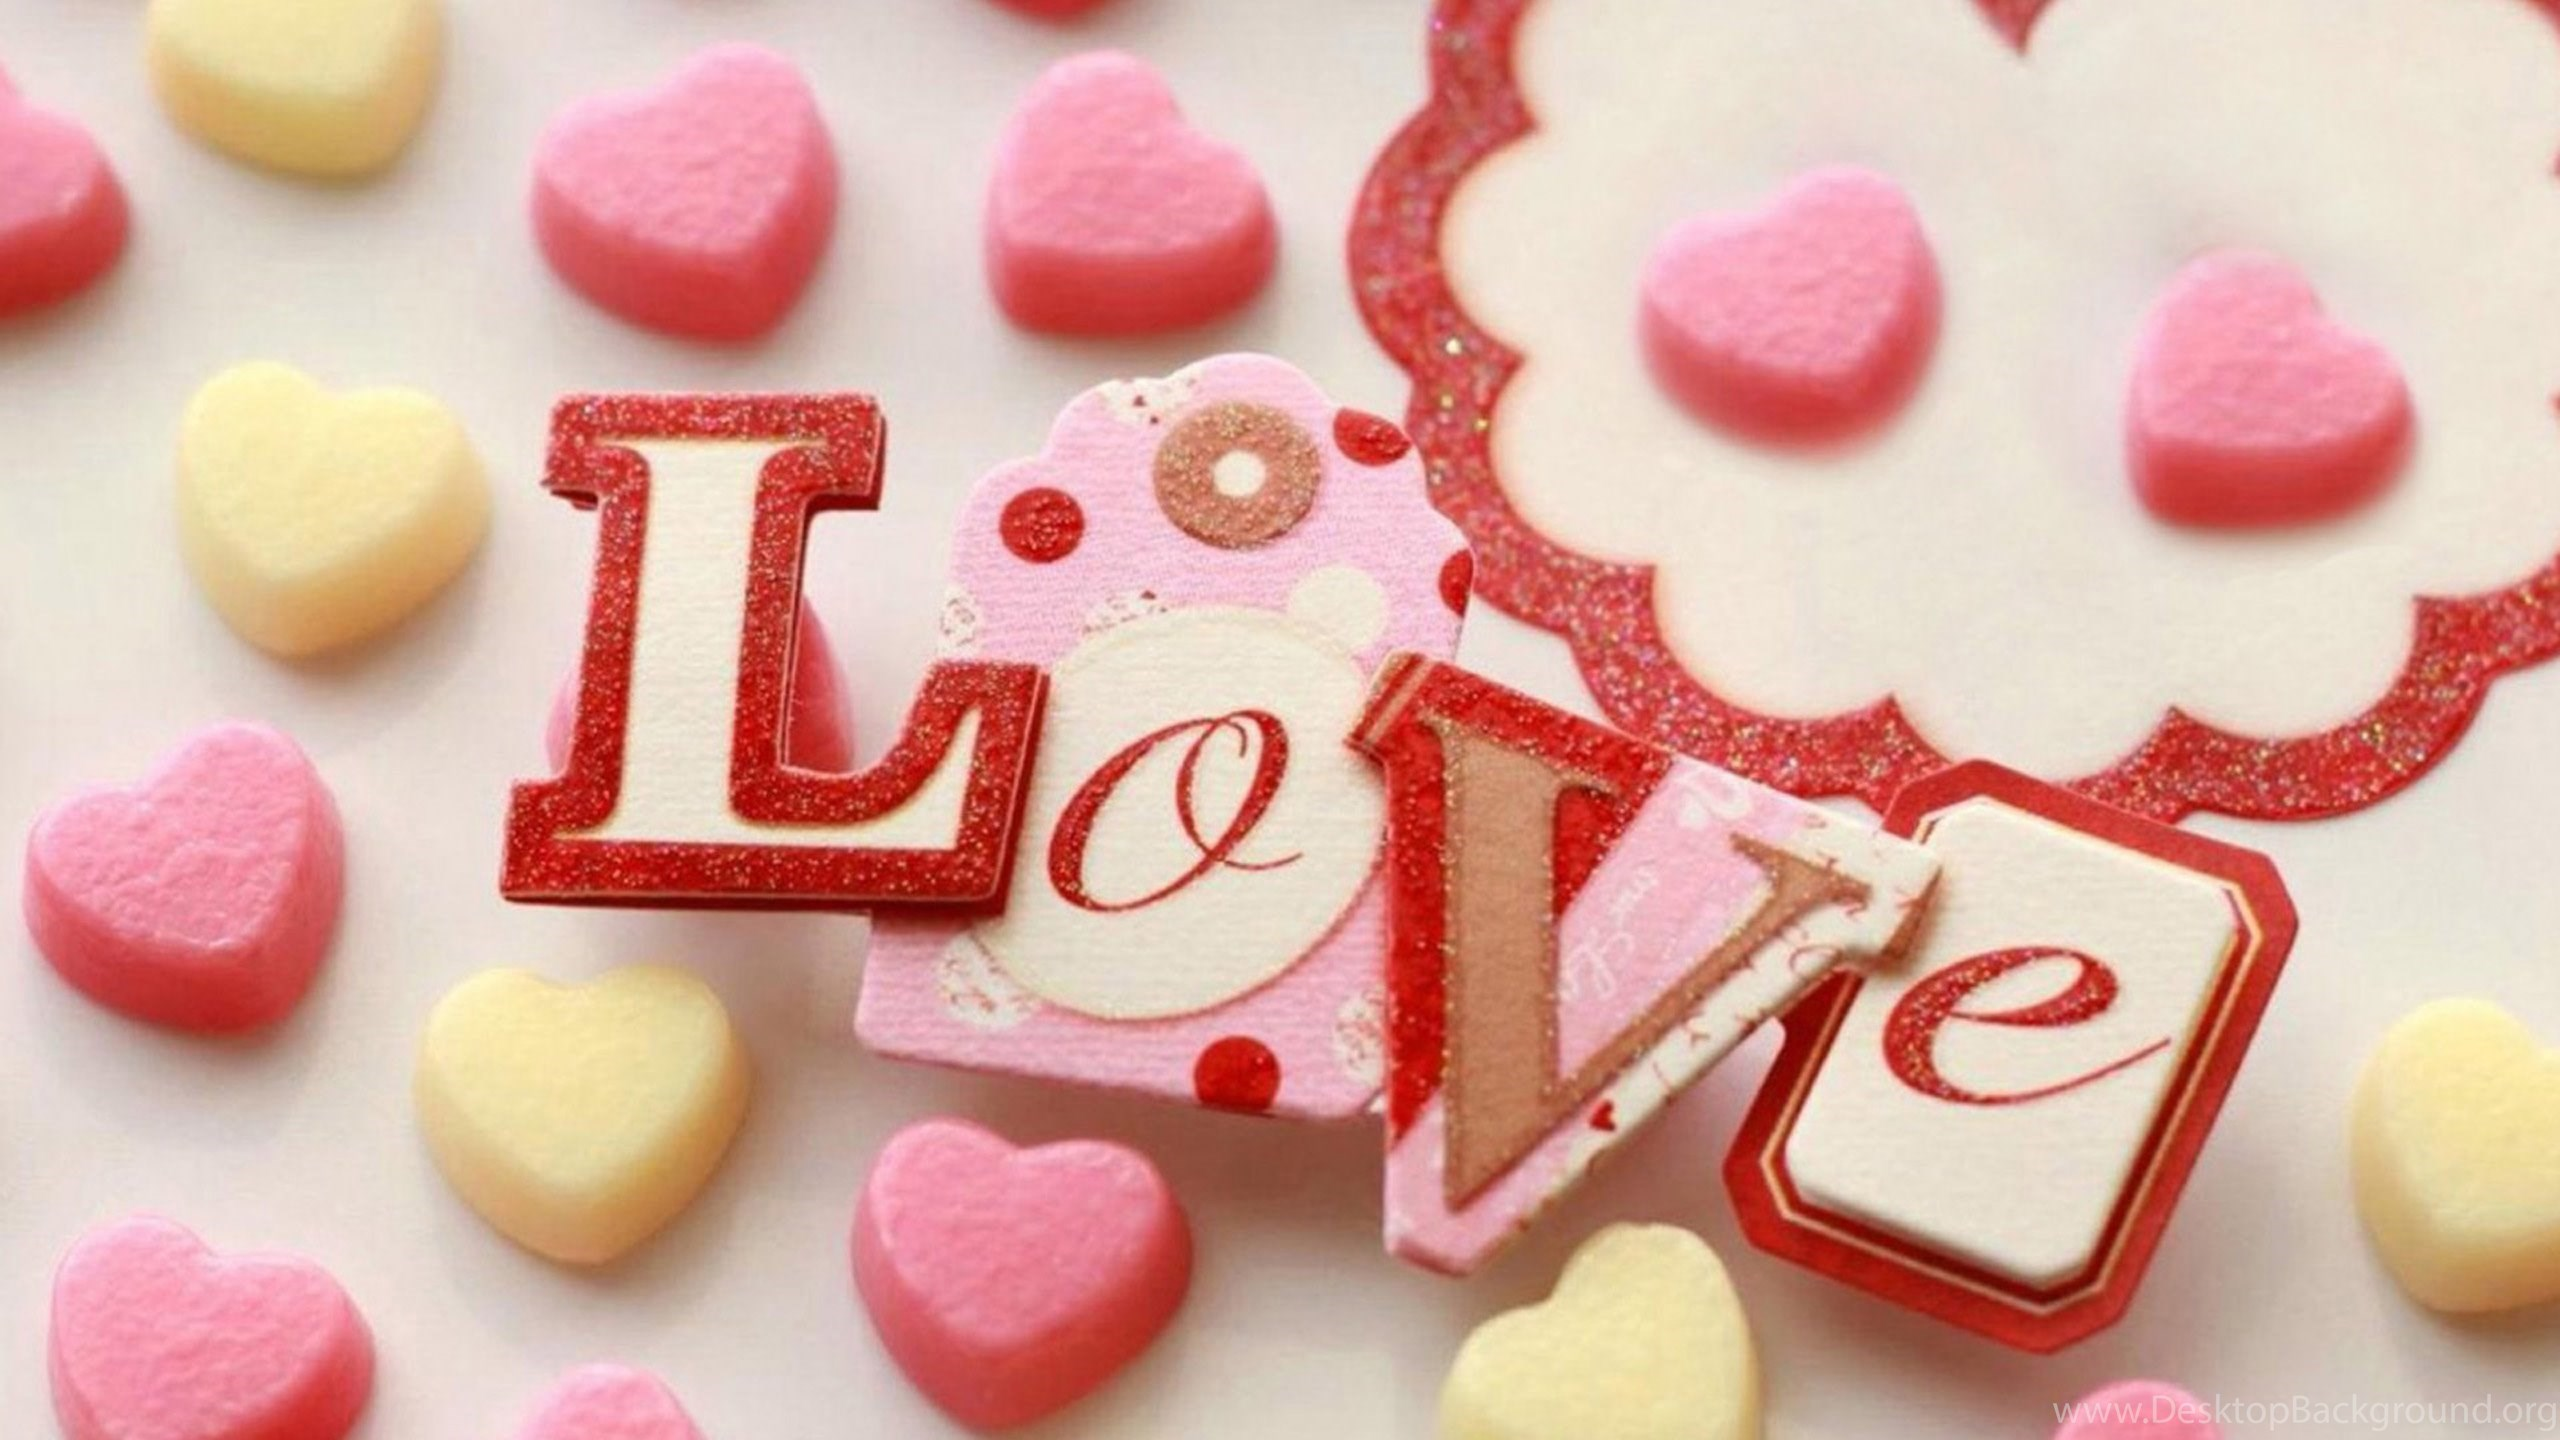 sweet love wallpapers high definition uncalke desktop background